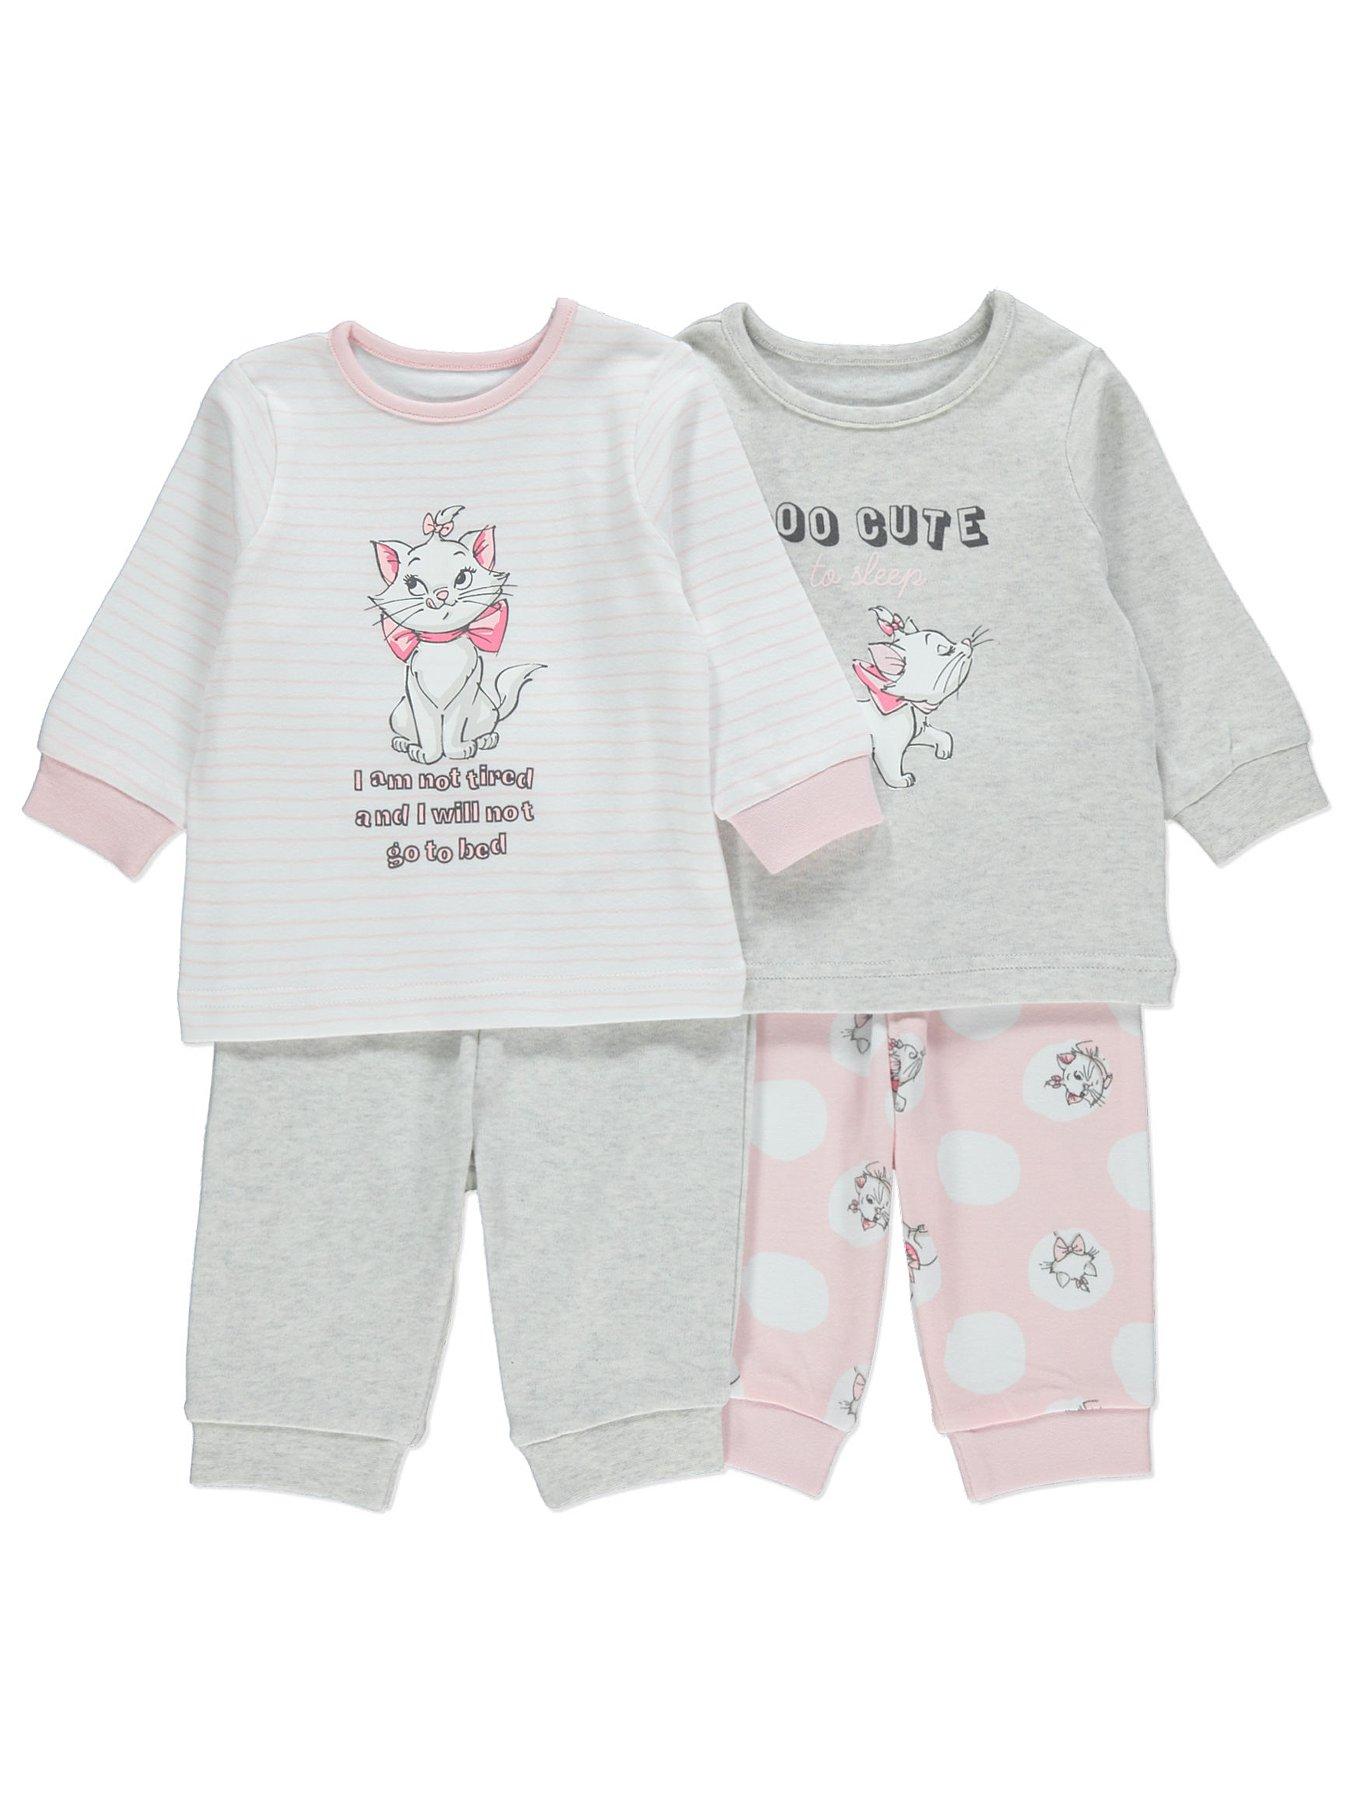 Disney Aristocats Marie Slogan Pyjamas 2 Pack. Reset edeb2f3f7